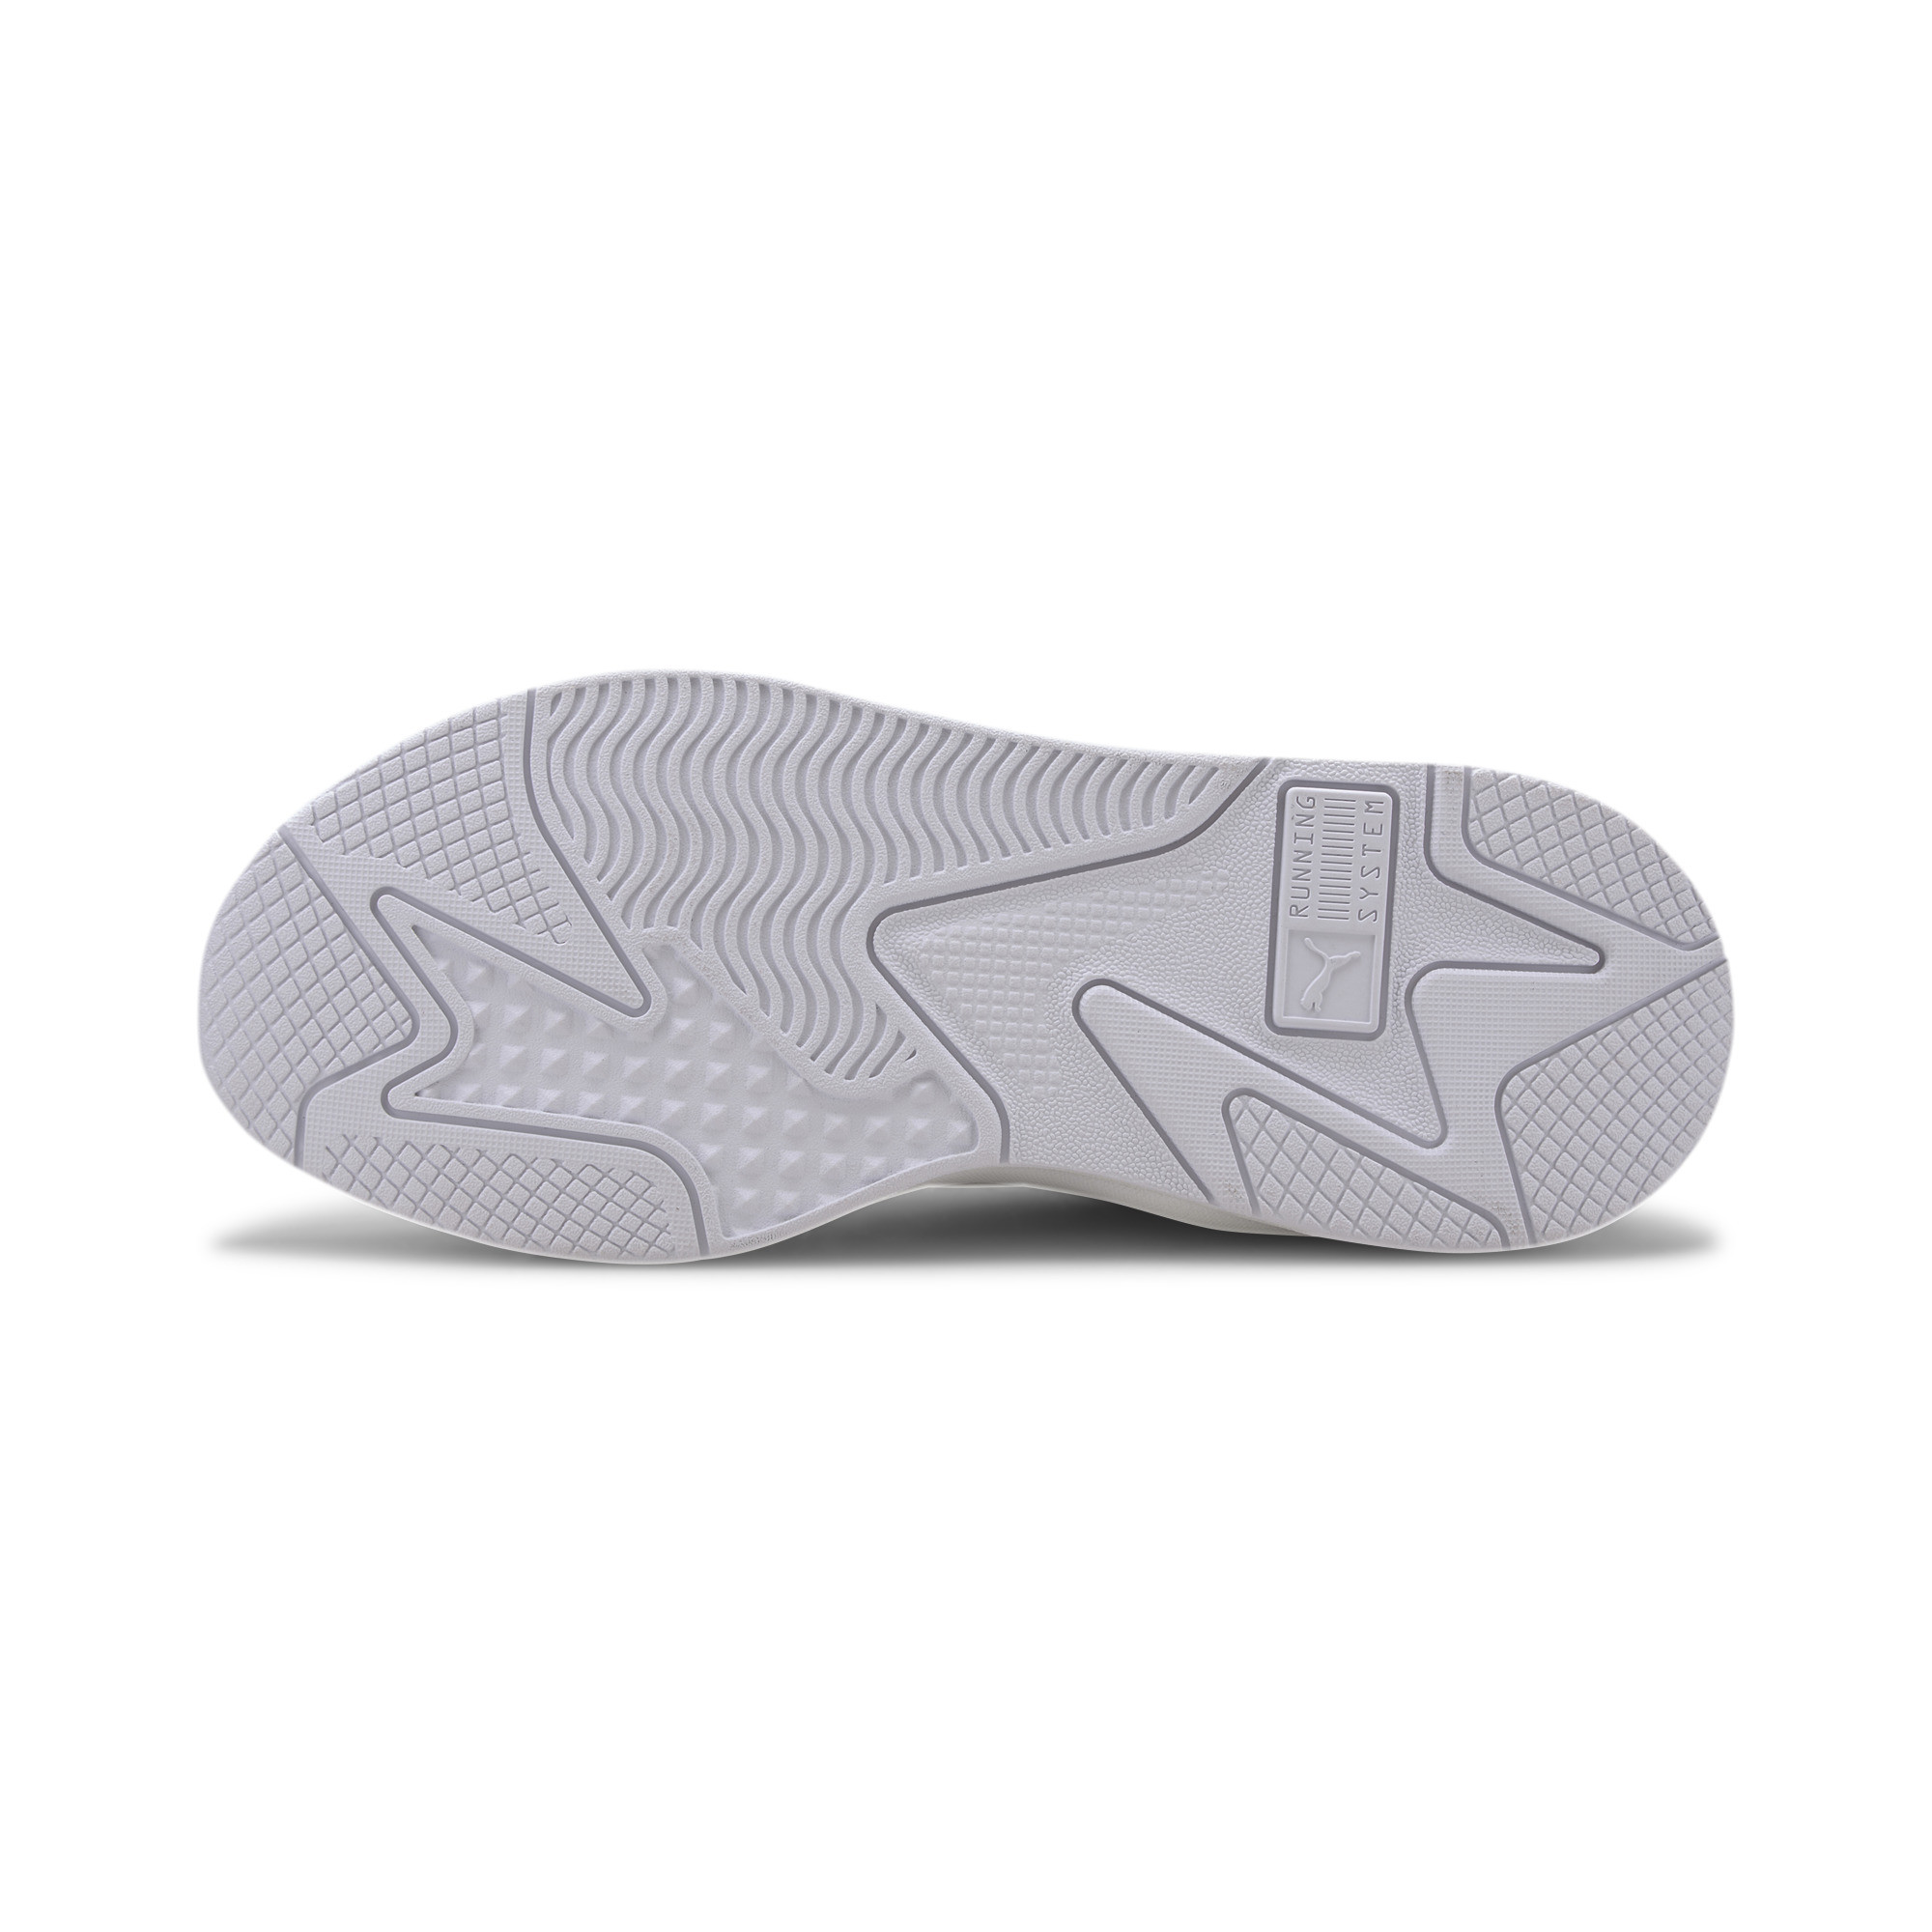 PUMA-Men-039-s-RS-X-Puzzle-Sneakers thumbnail 19